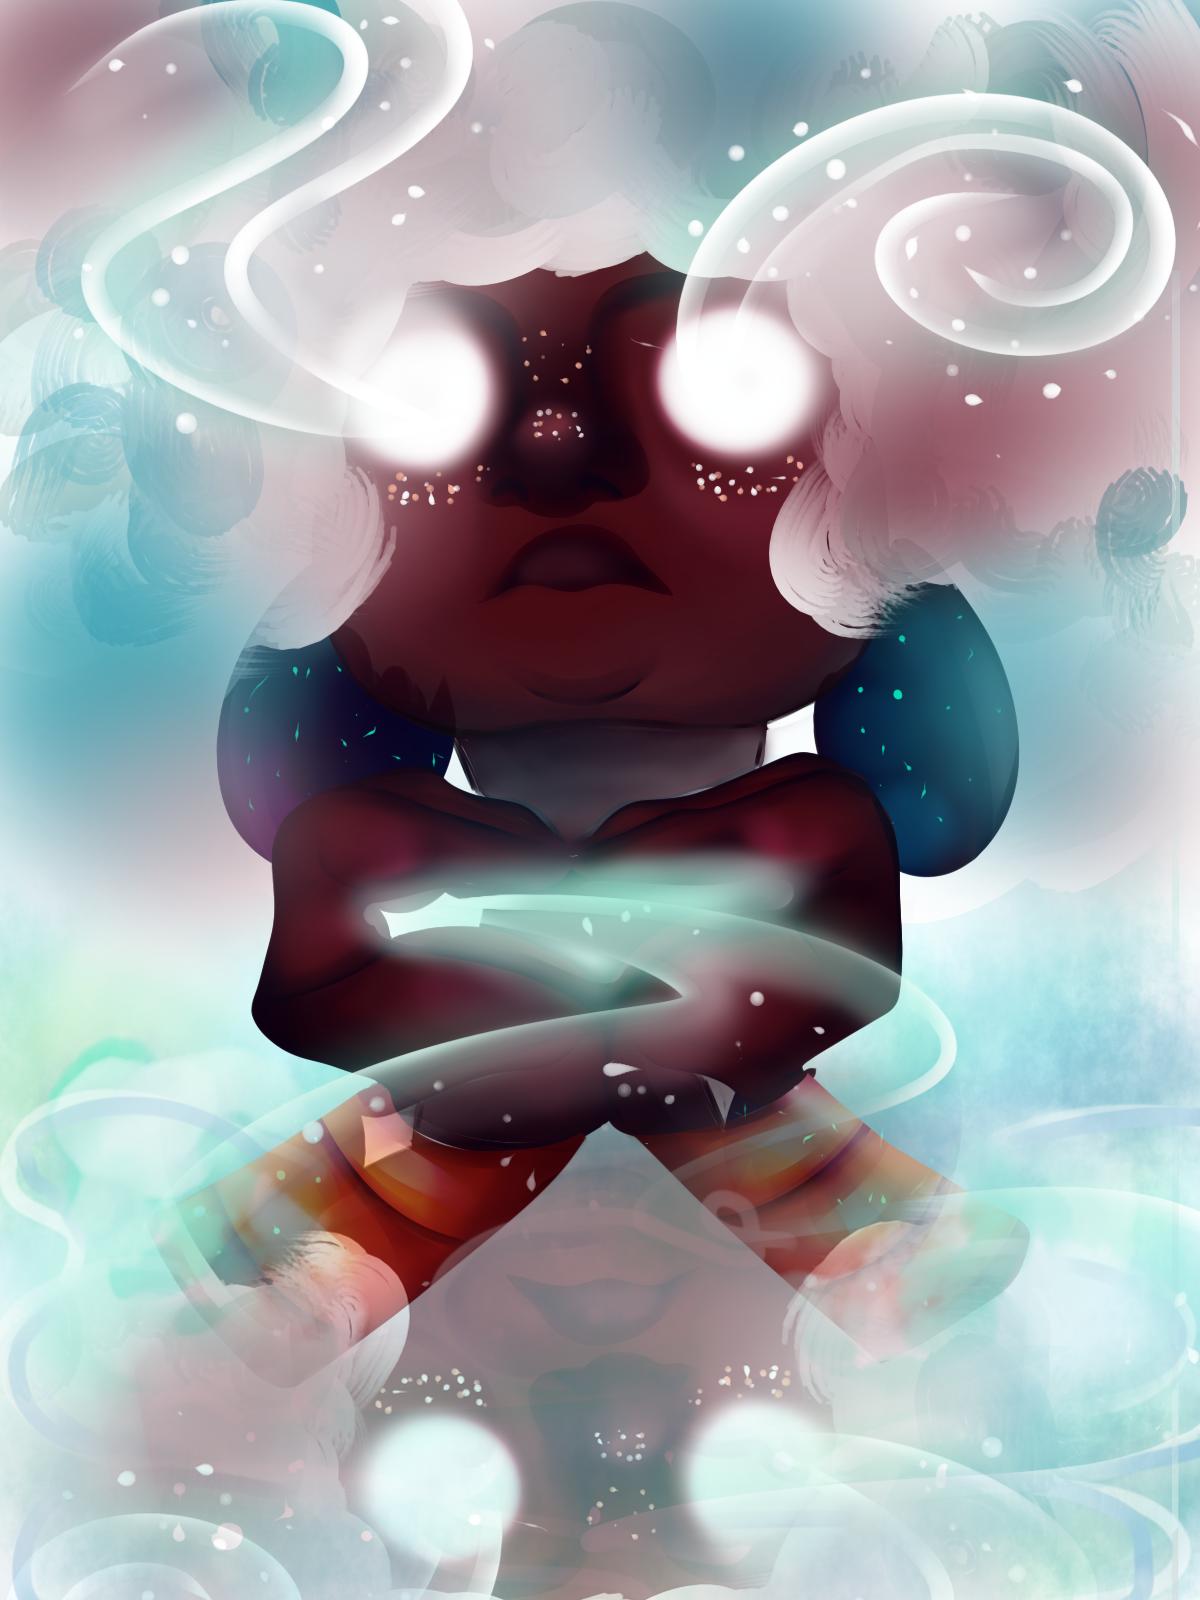 Spiritual Goddess